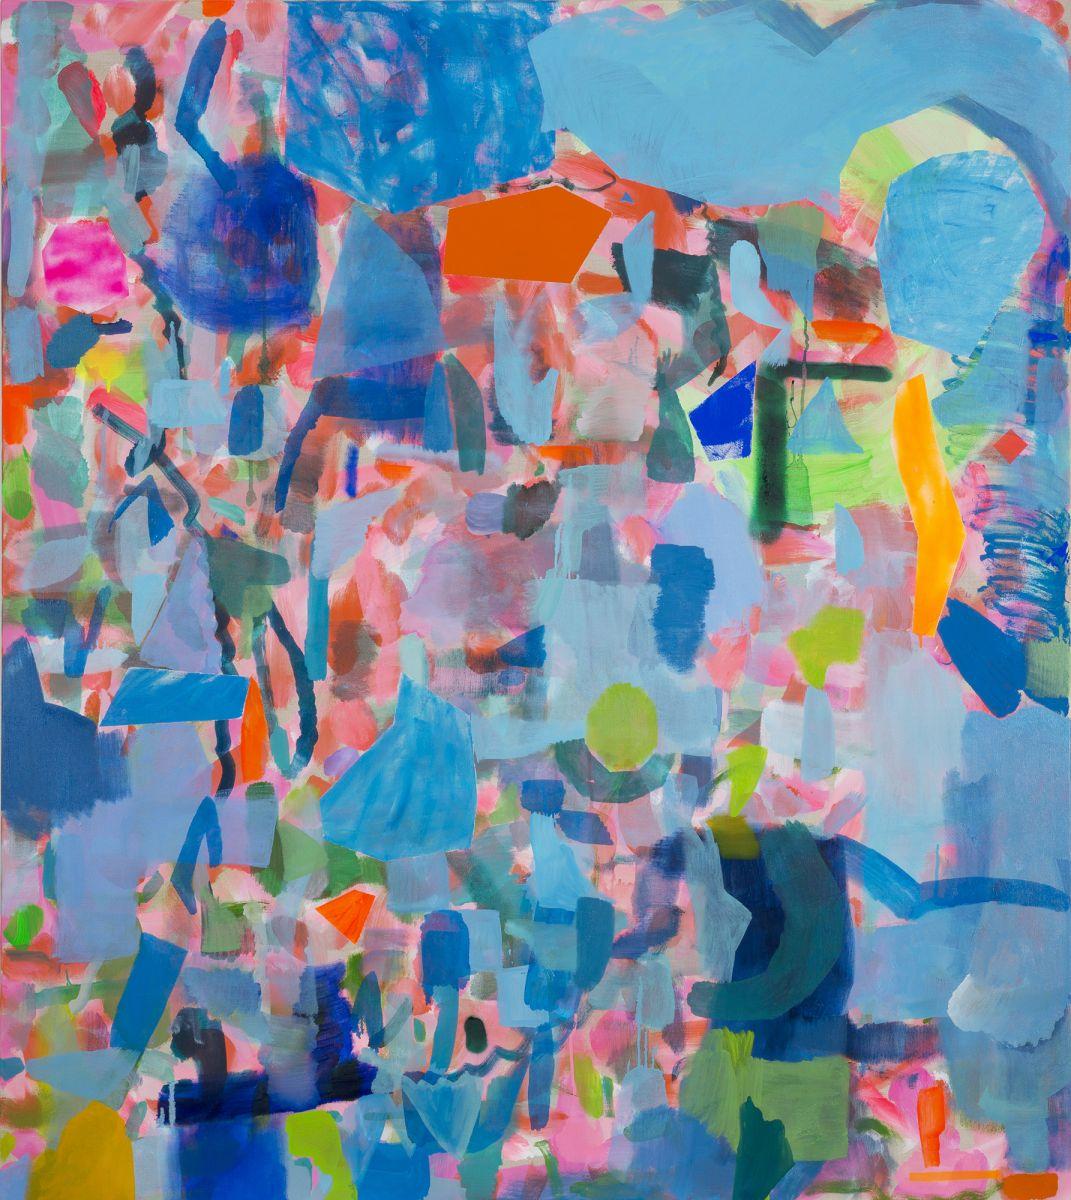 ' Fragments II 2016 ' Oil and acrylic on linen 152 x 137cm